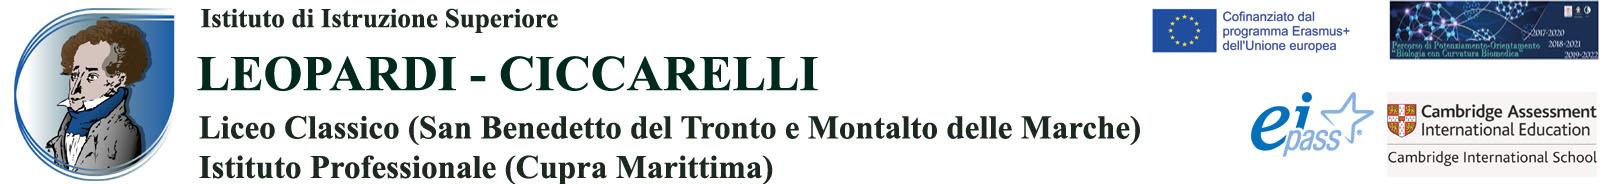 iisleopardiciccarelli